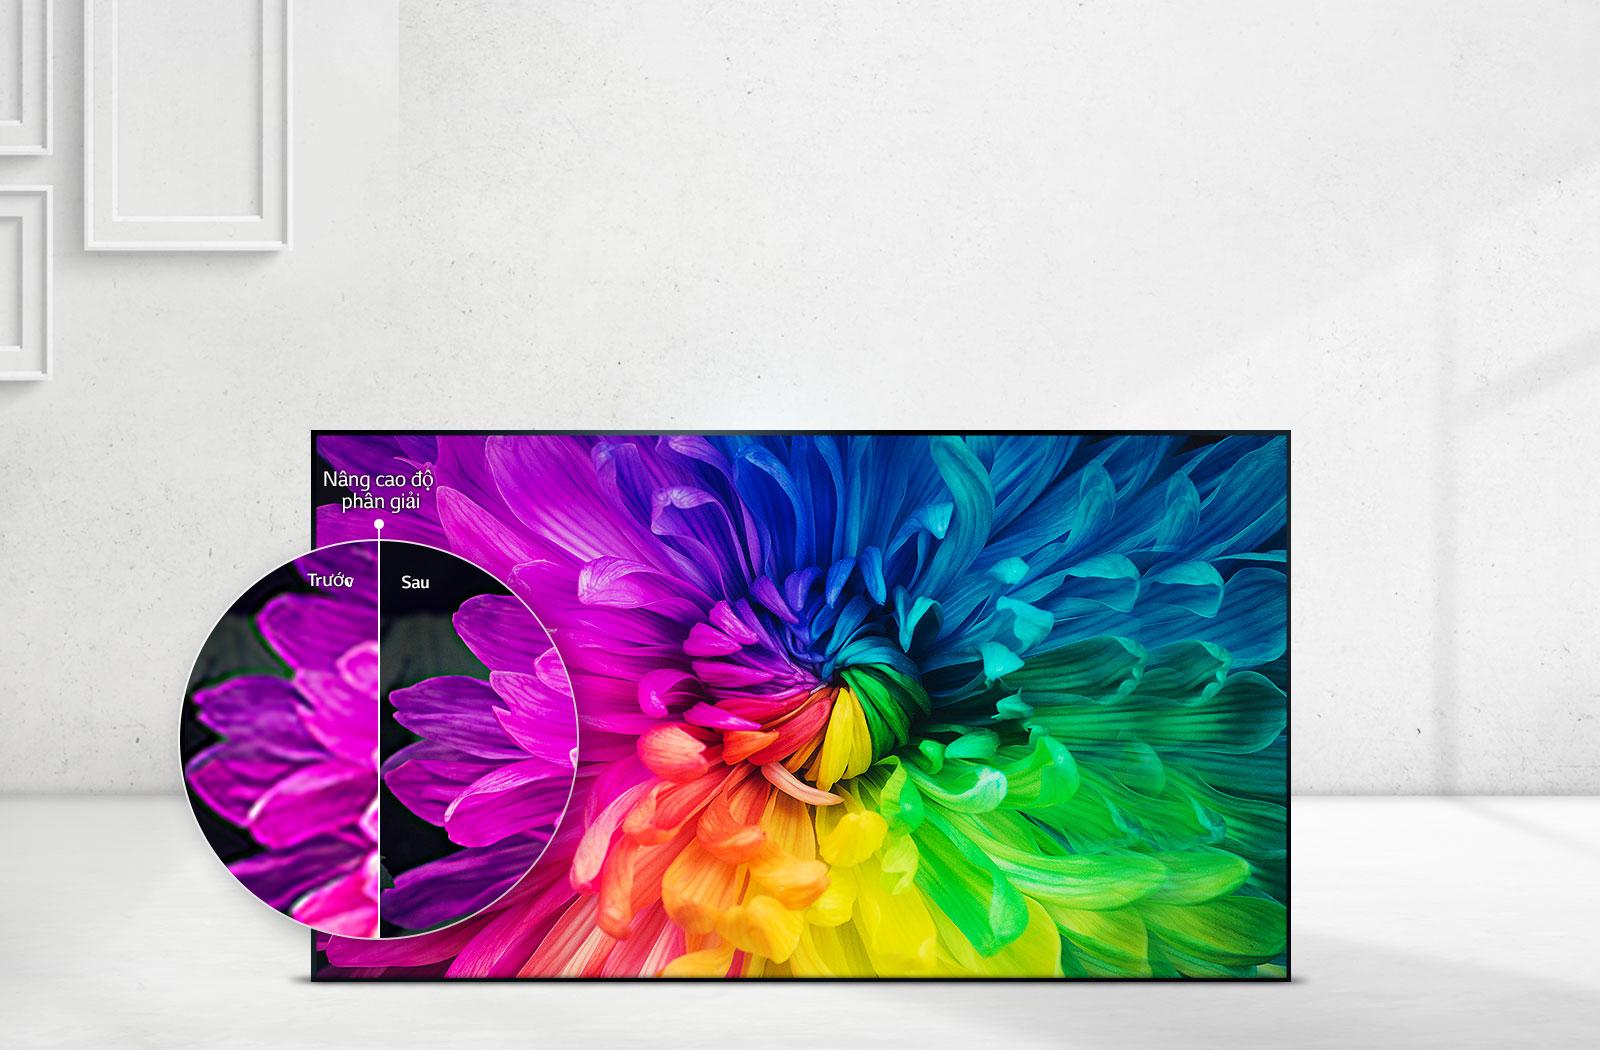 LG 65UV340C 64.6 inch 4K Ultra HD Black LED TV